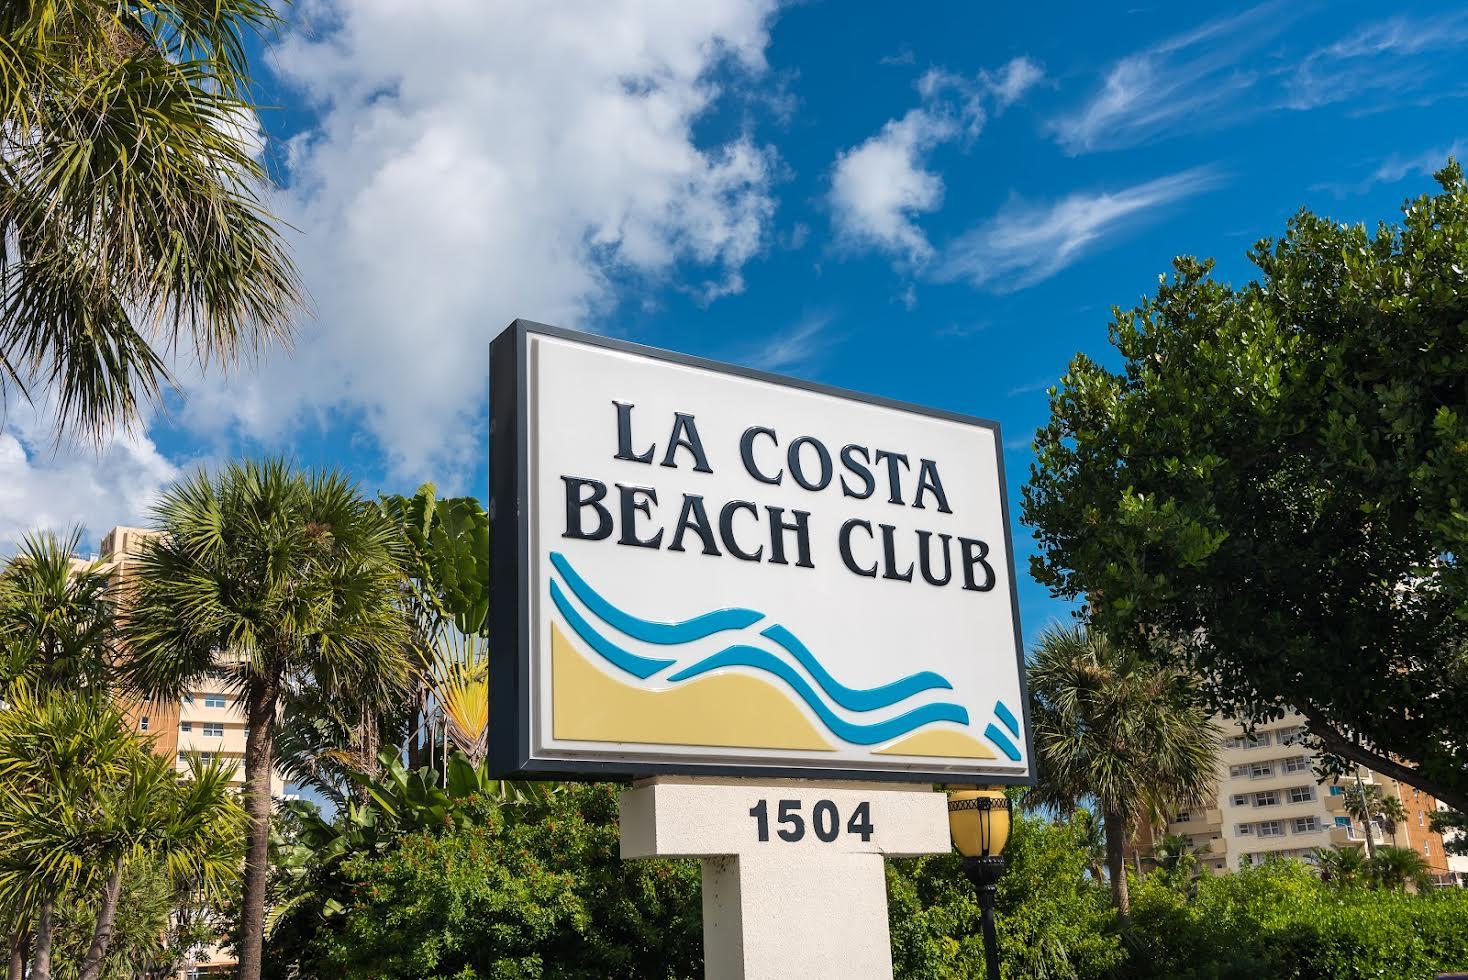 La Costa Beach Club Picture Number 19